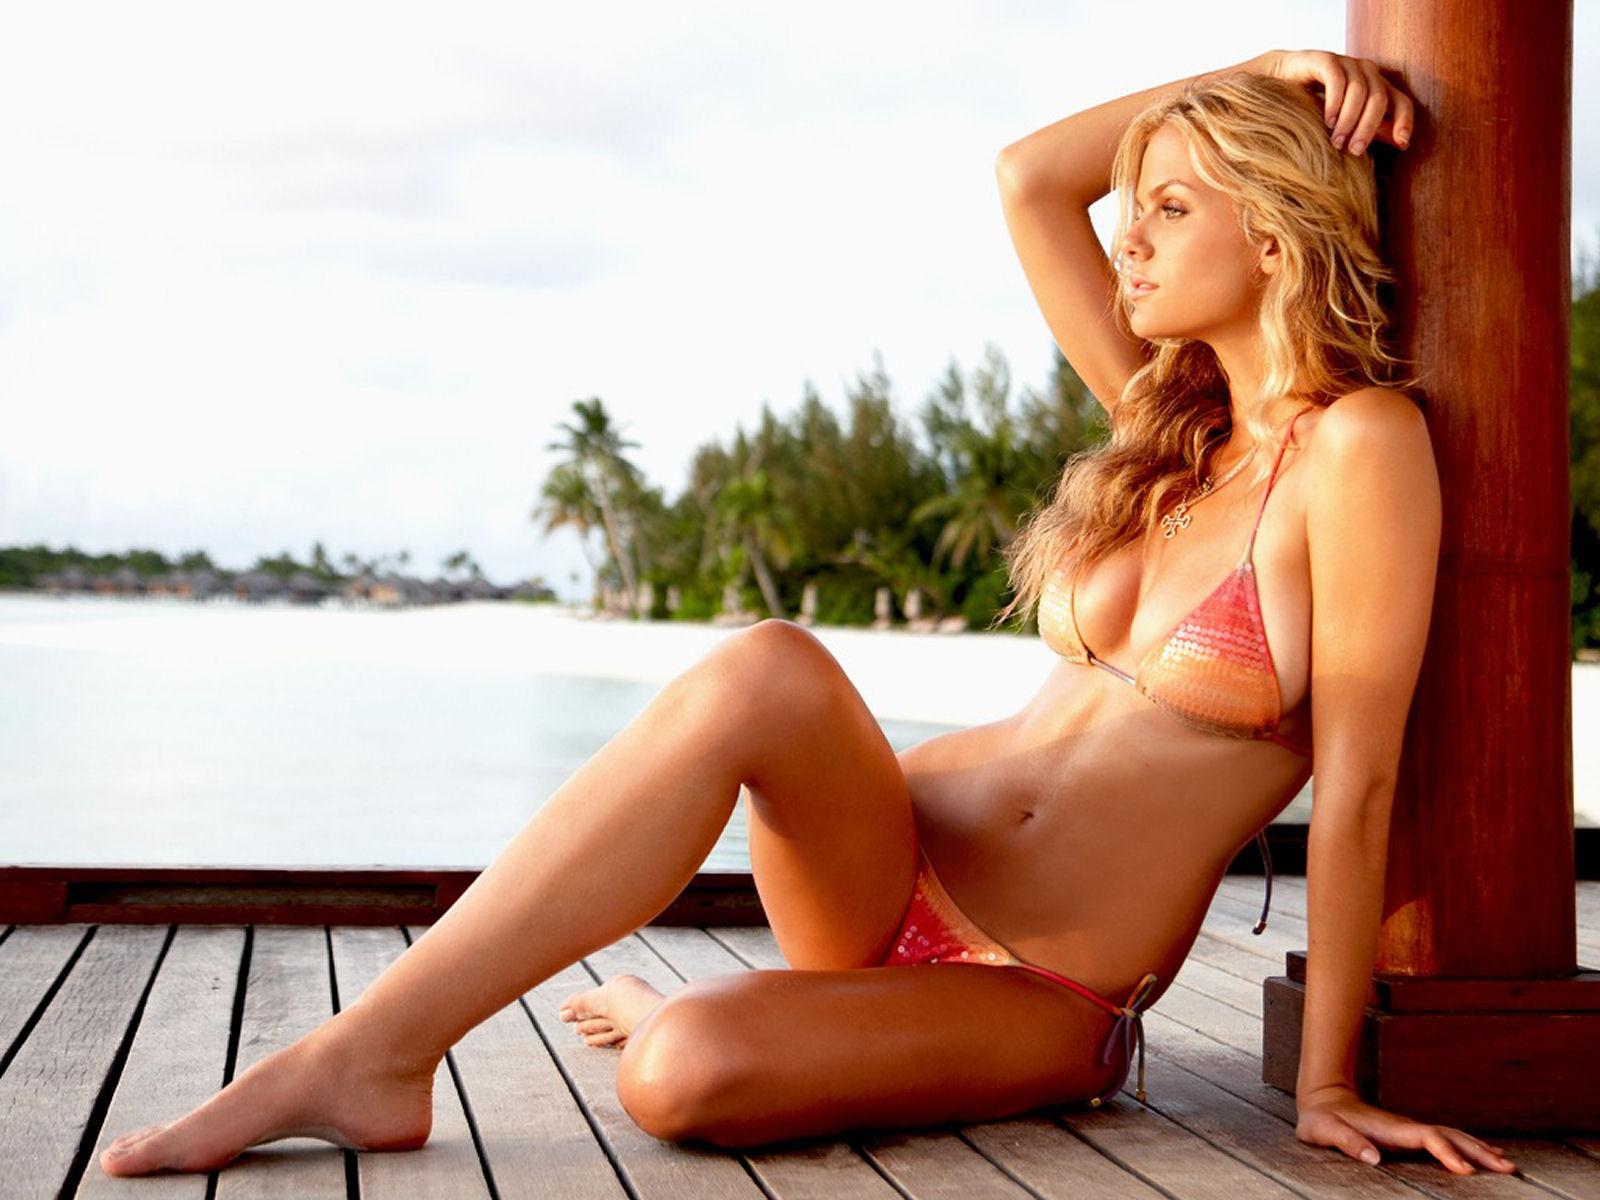 http://3.bp.blogspot.com/-WRviBO0NwPo/TpmbI1tlsrI/AAAAAAAABJk/XQRpV-dMJxE/s1600/Brooklyn+Decker+IN+Bikini+%25288%2529.jpg